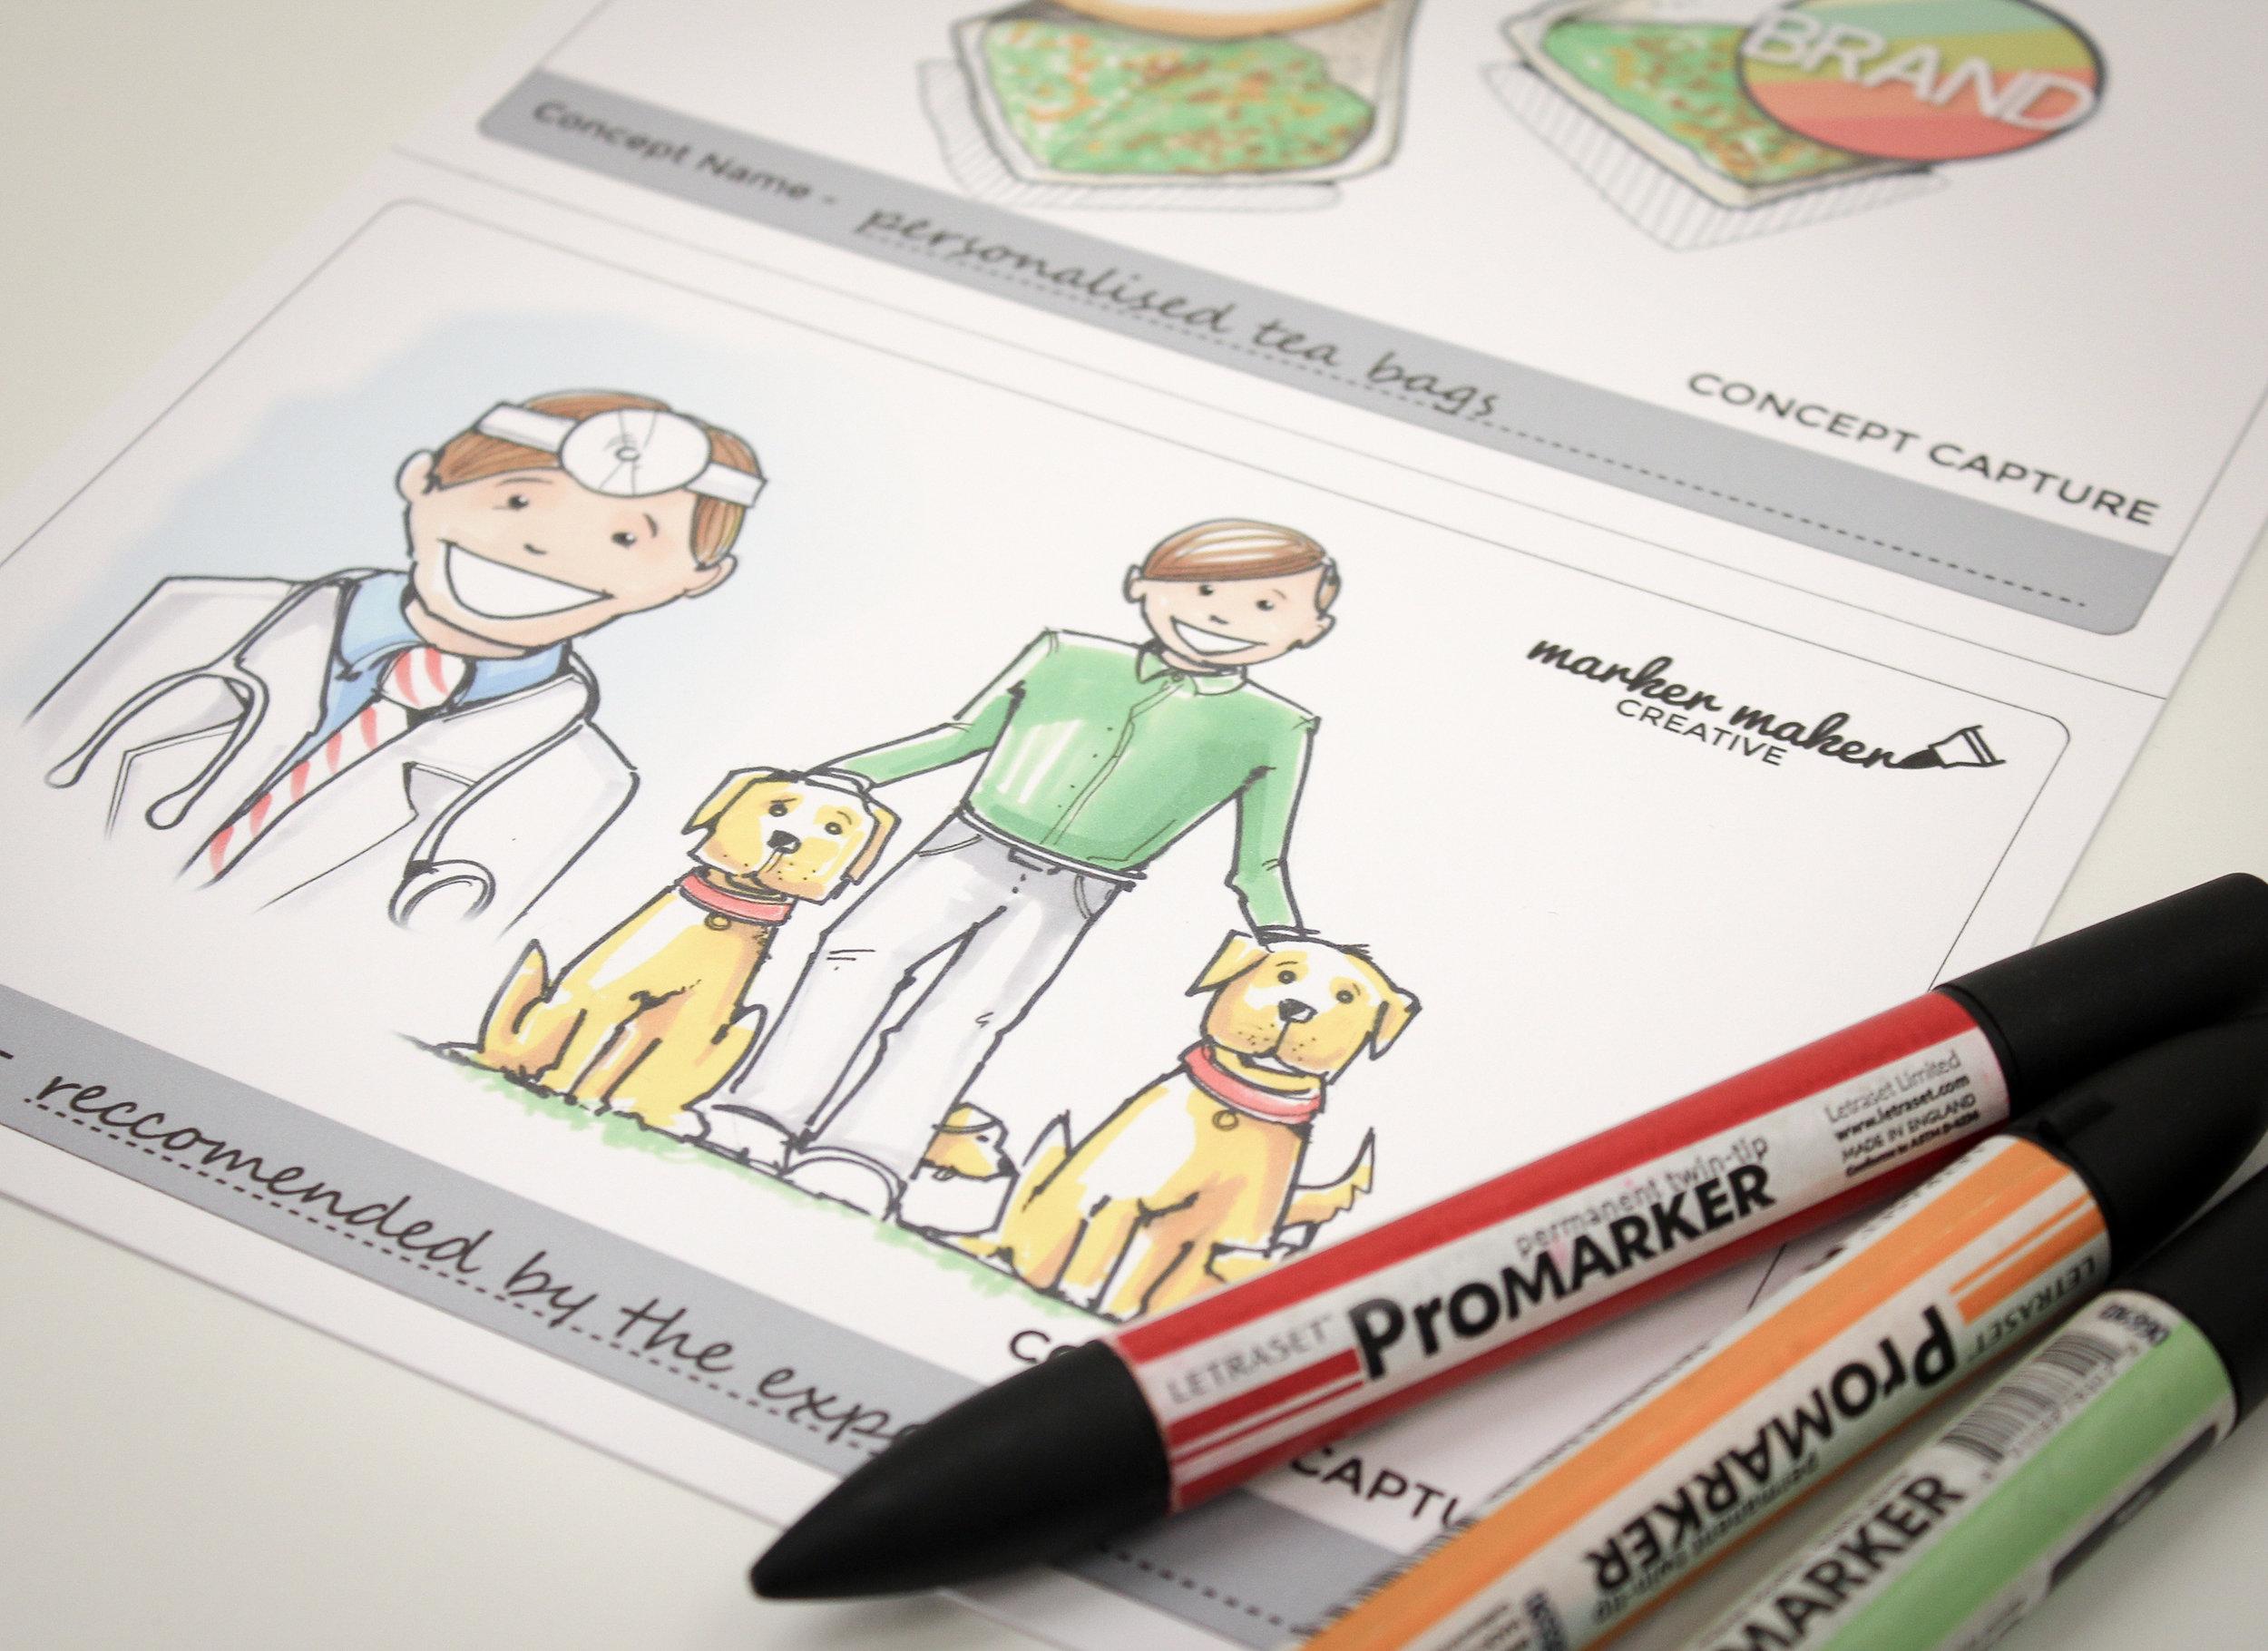 Marker pen concept visuals - post workshop capture